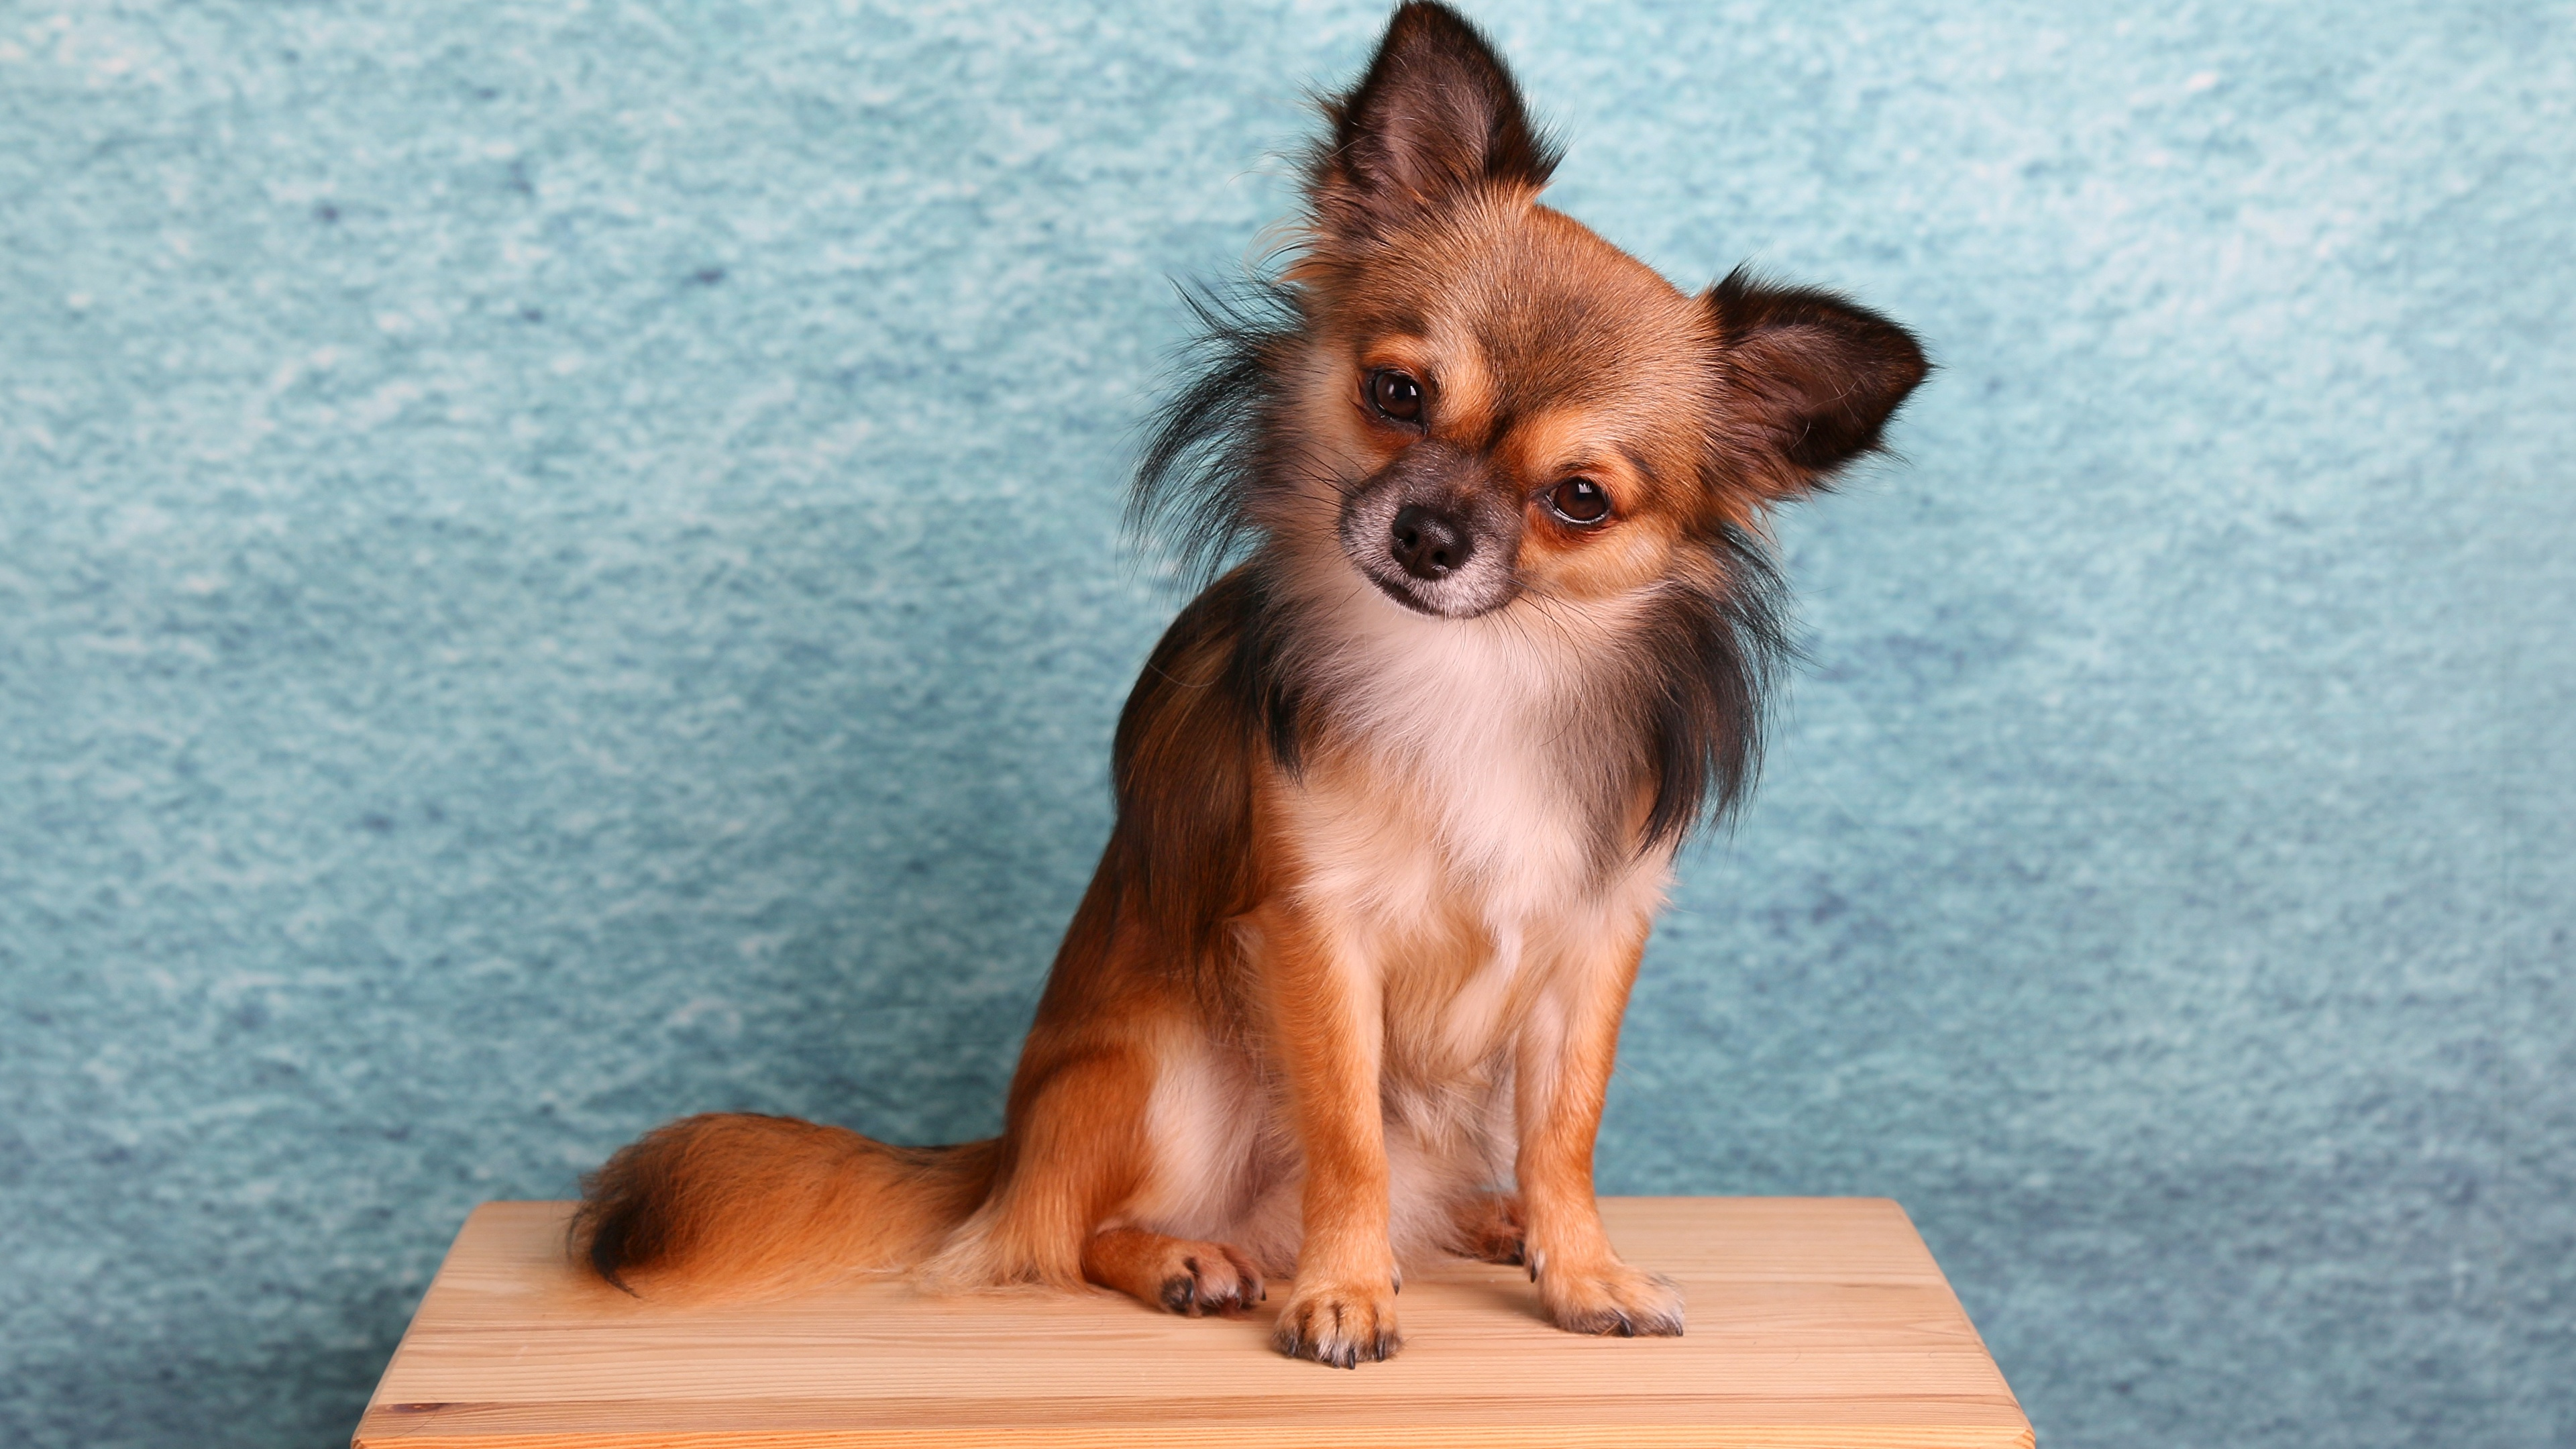 Картинки Чихуахуа Собаки сидя Животные 3840x2160 собака Сидит сидящие животное